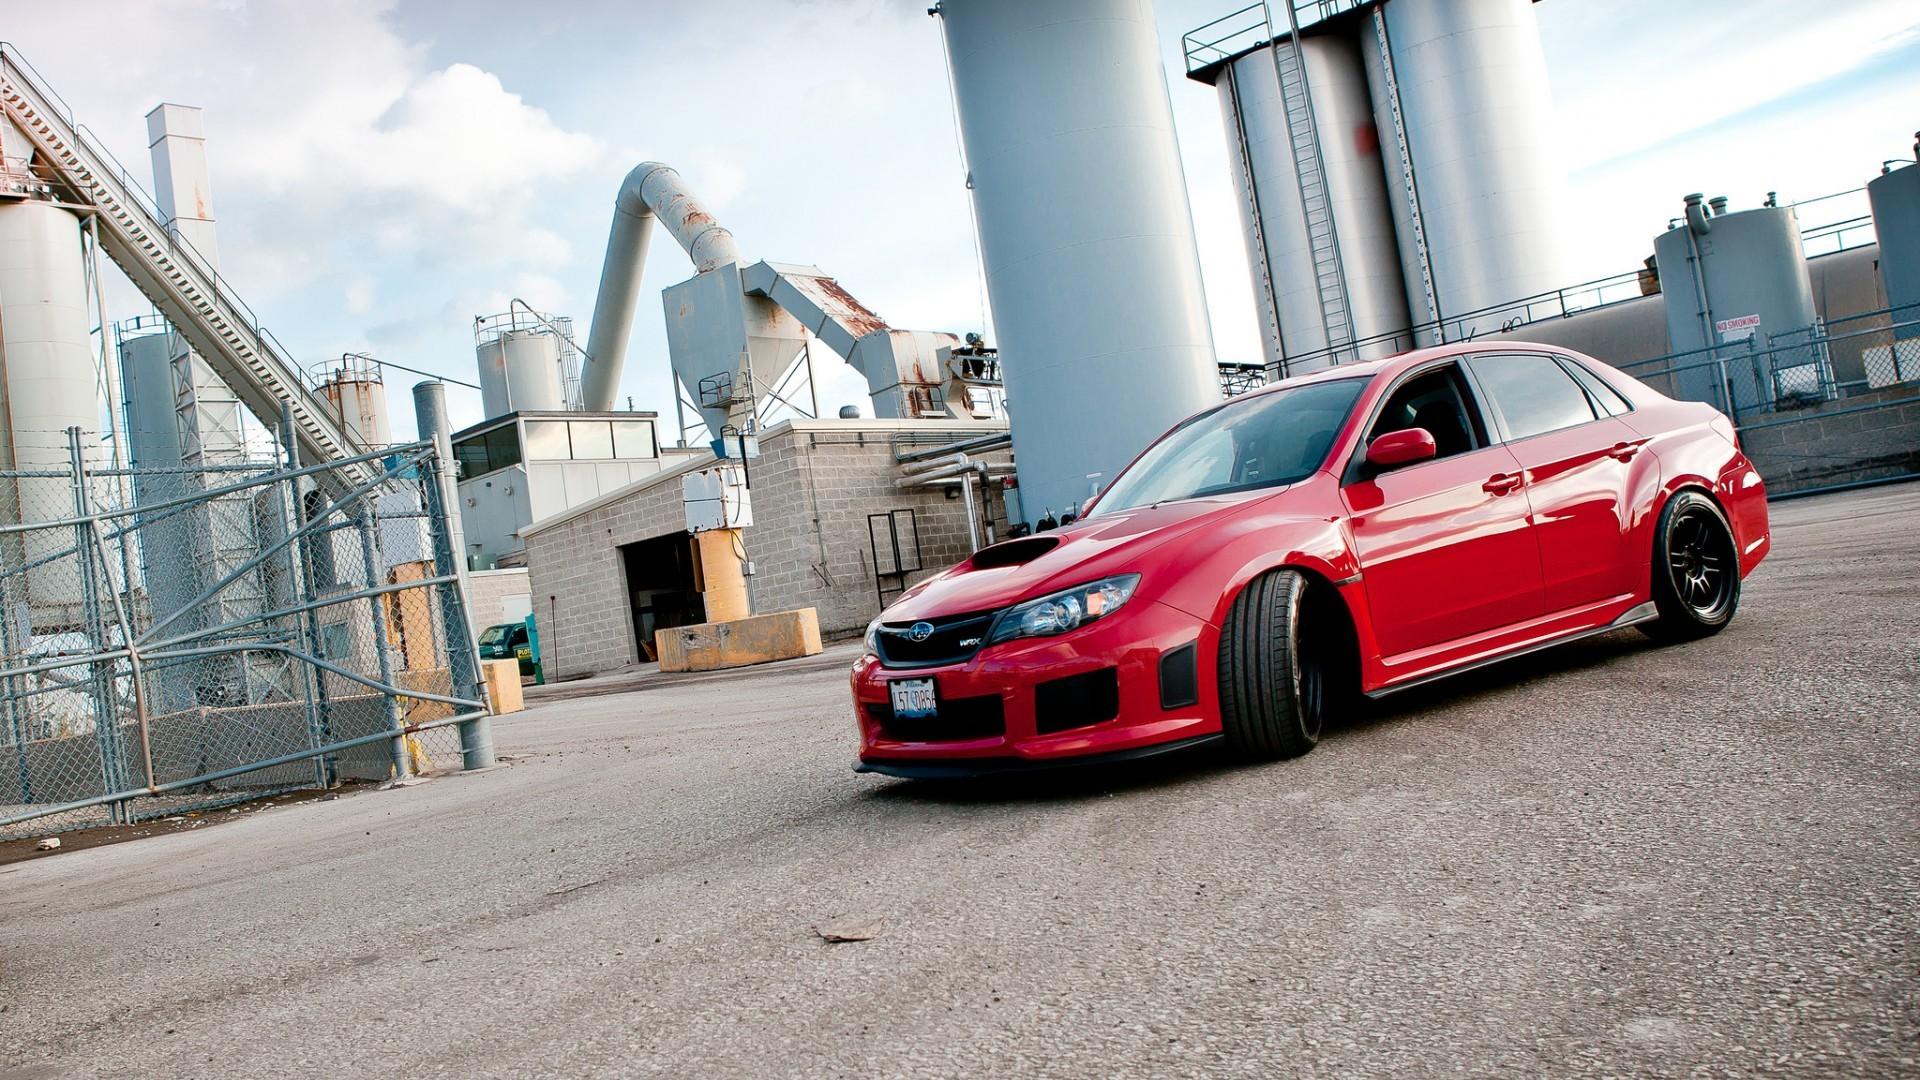 Cars Tuning Subaru Impreza Wrx Jdm Wallpaper: Subaru Wrx Sti Wallpaper (63+ Images